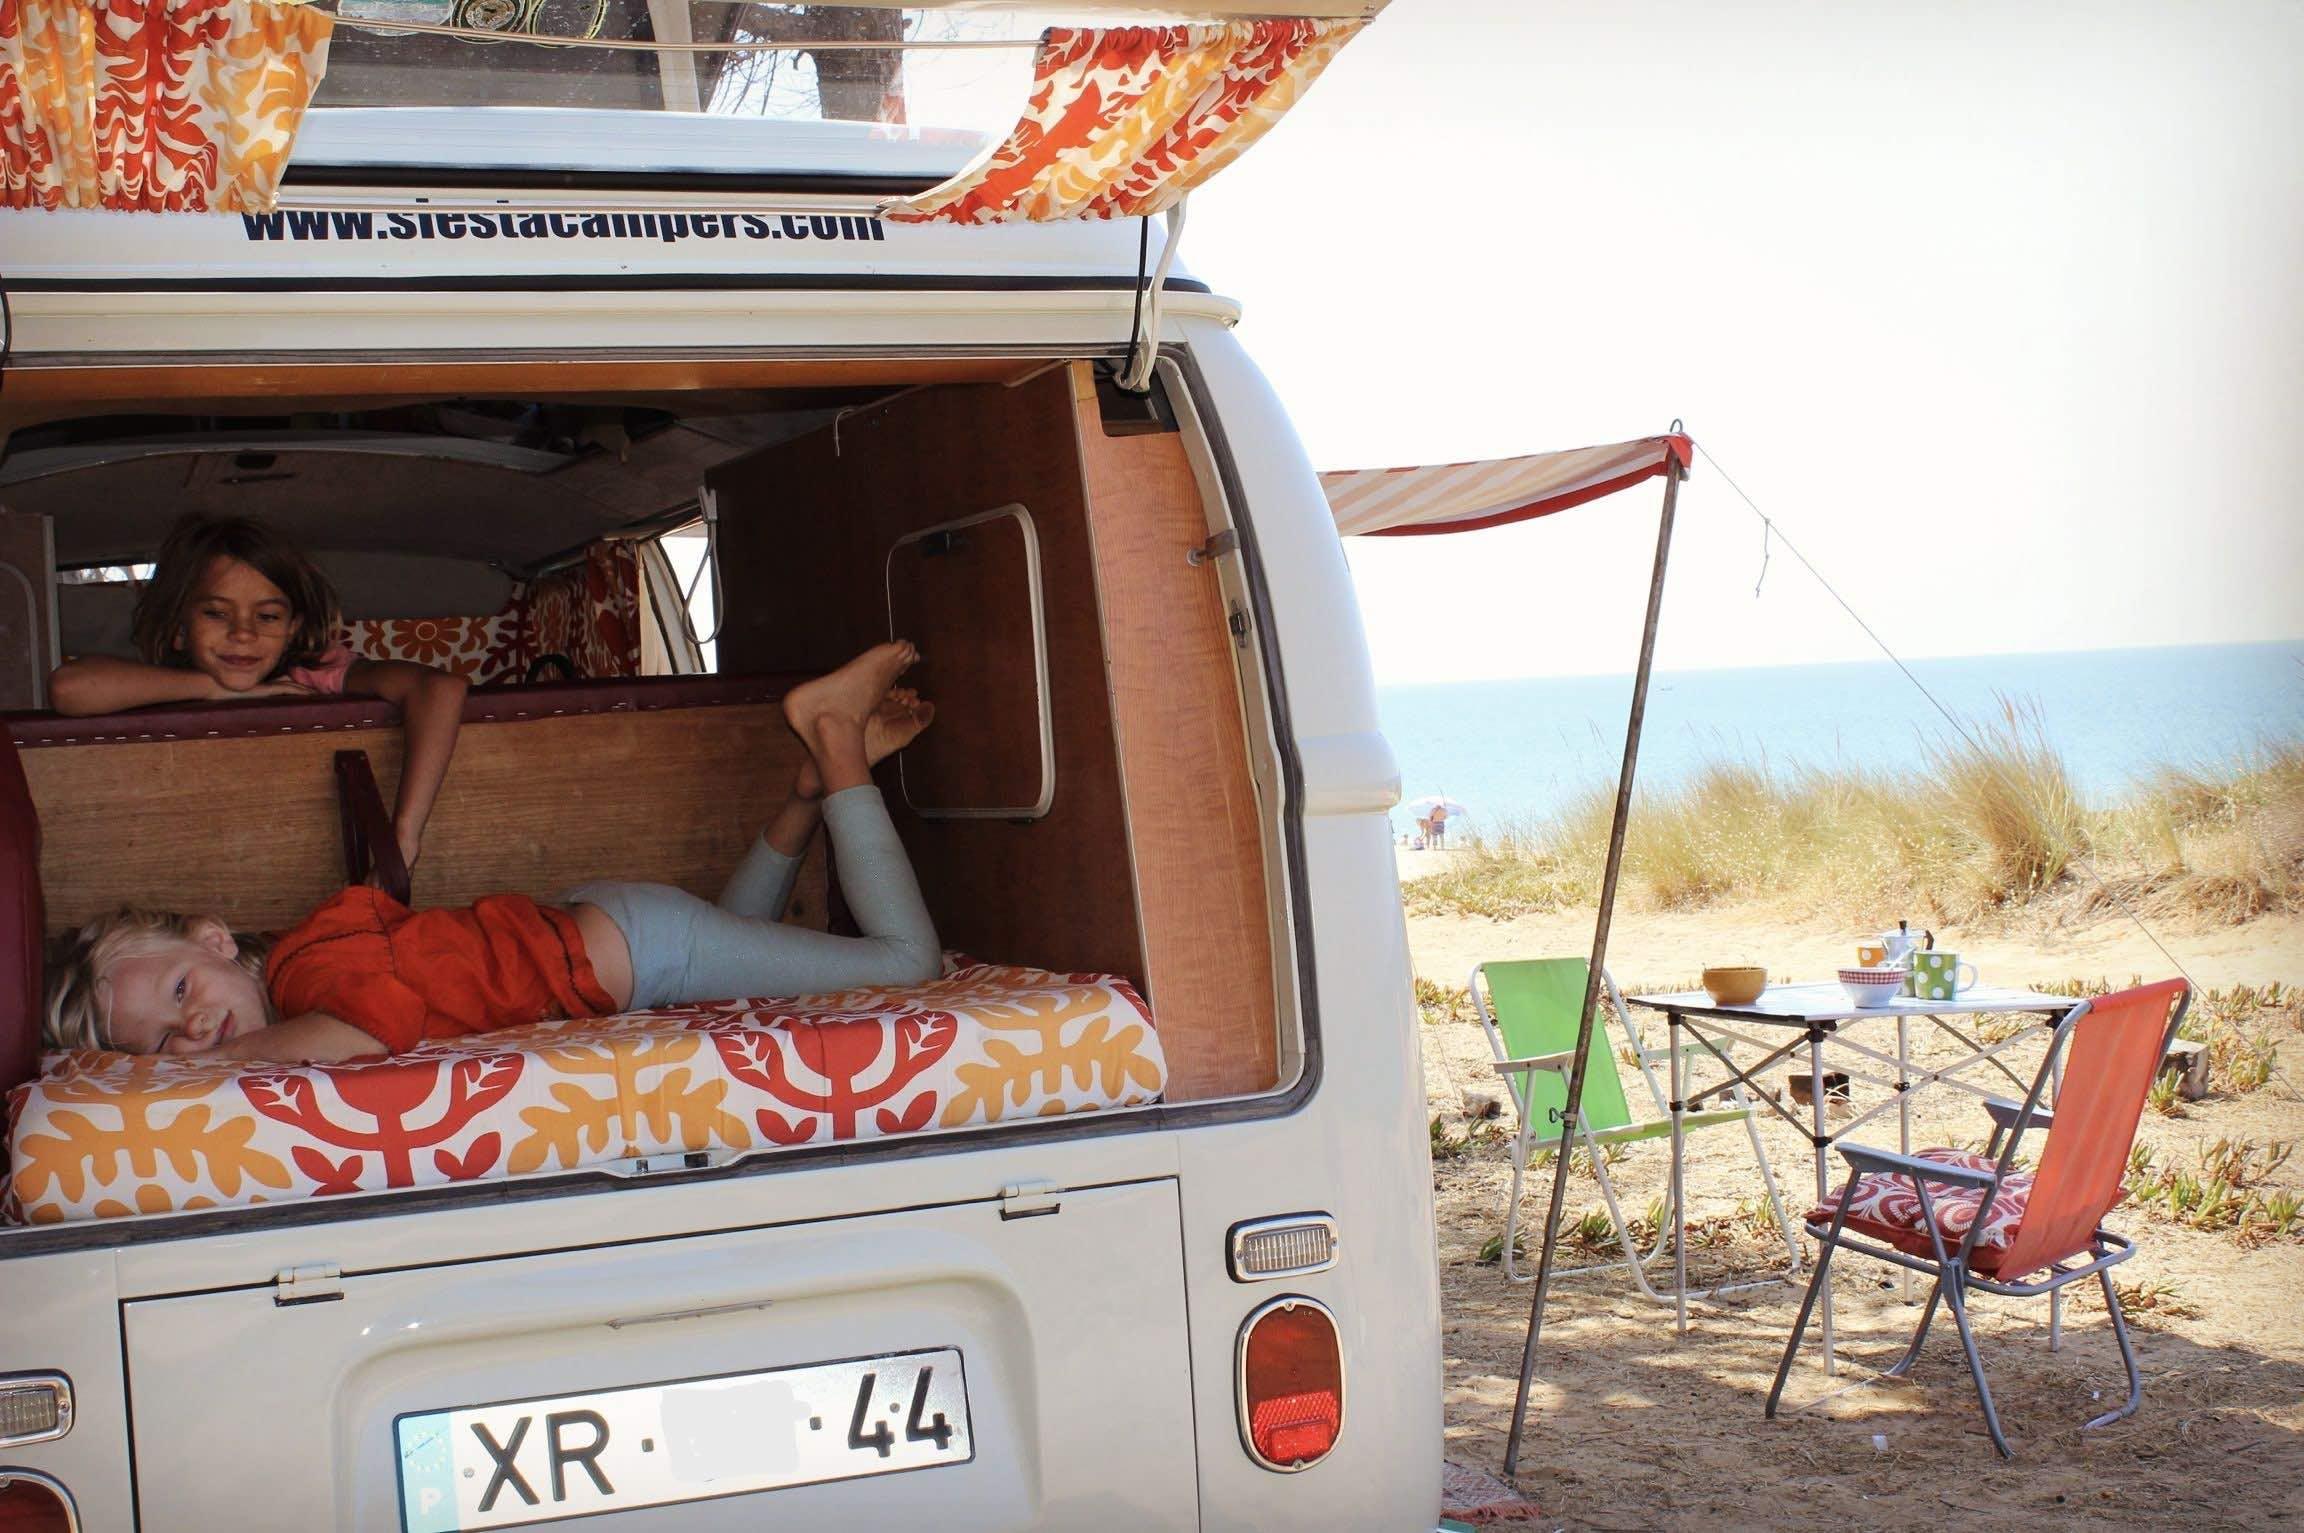 Kids enjoying the slow life in an old school campervan.